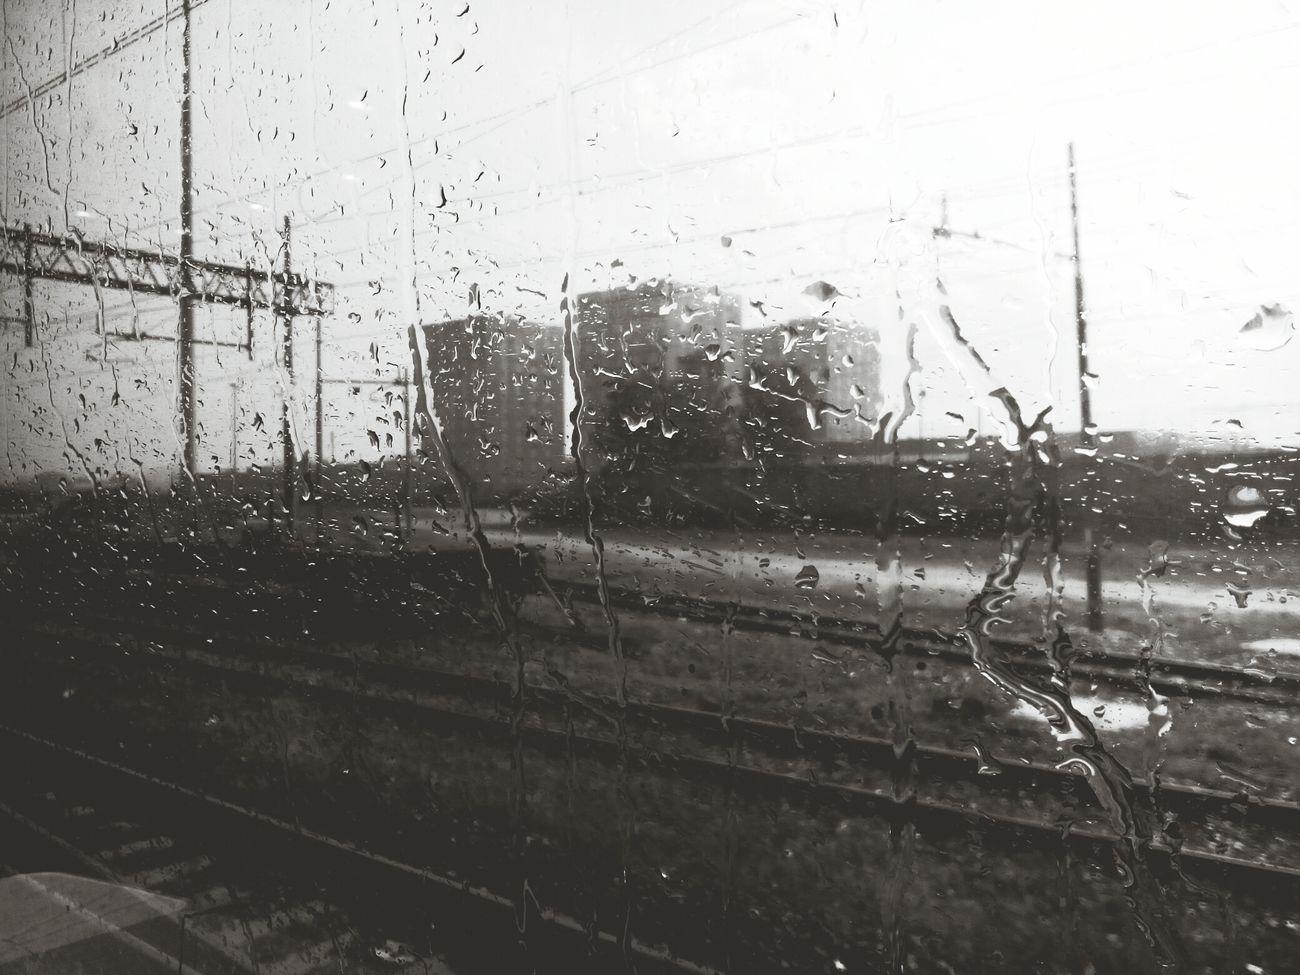 Shades Of Grey Buongiornolivorno Pioggiaa Eyem Gallery Rain Malinconia